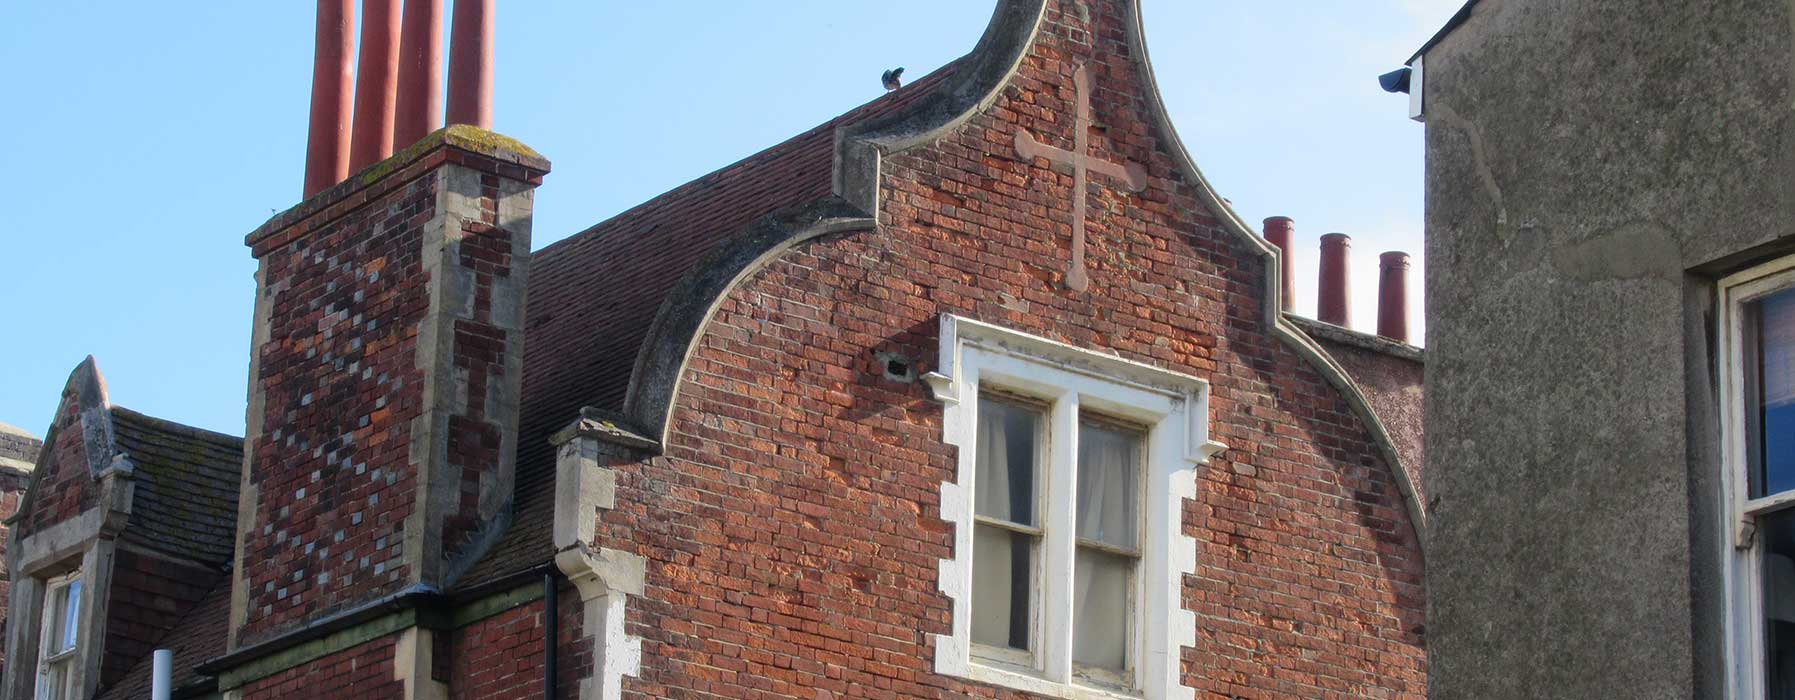 Homebuyer and Building Surveys